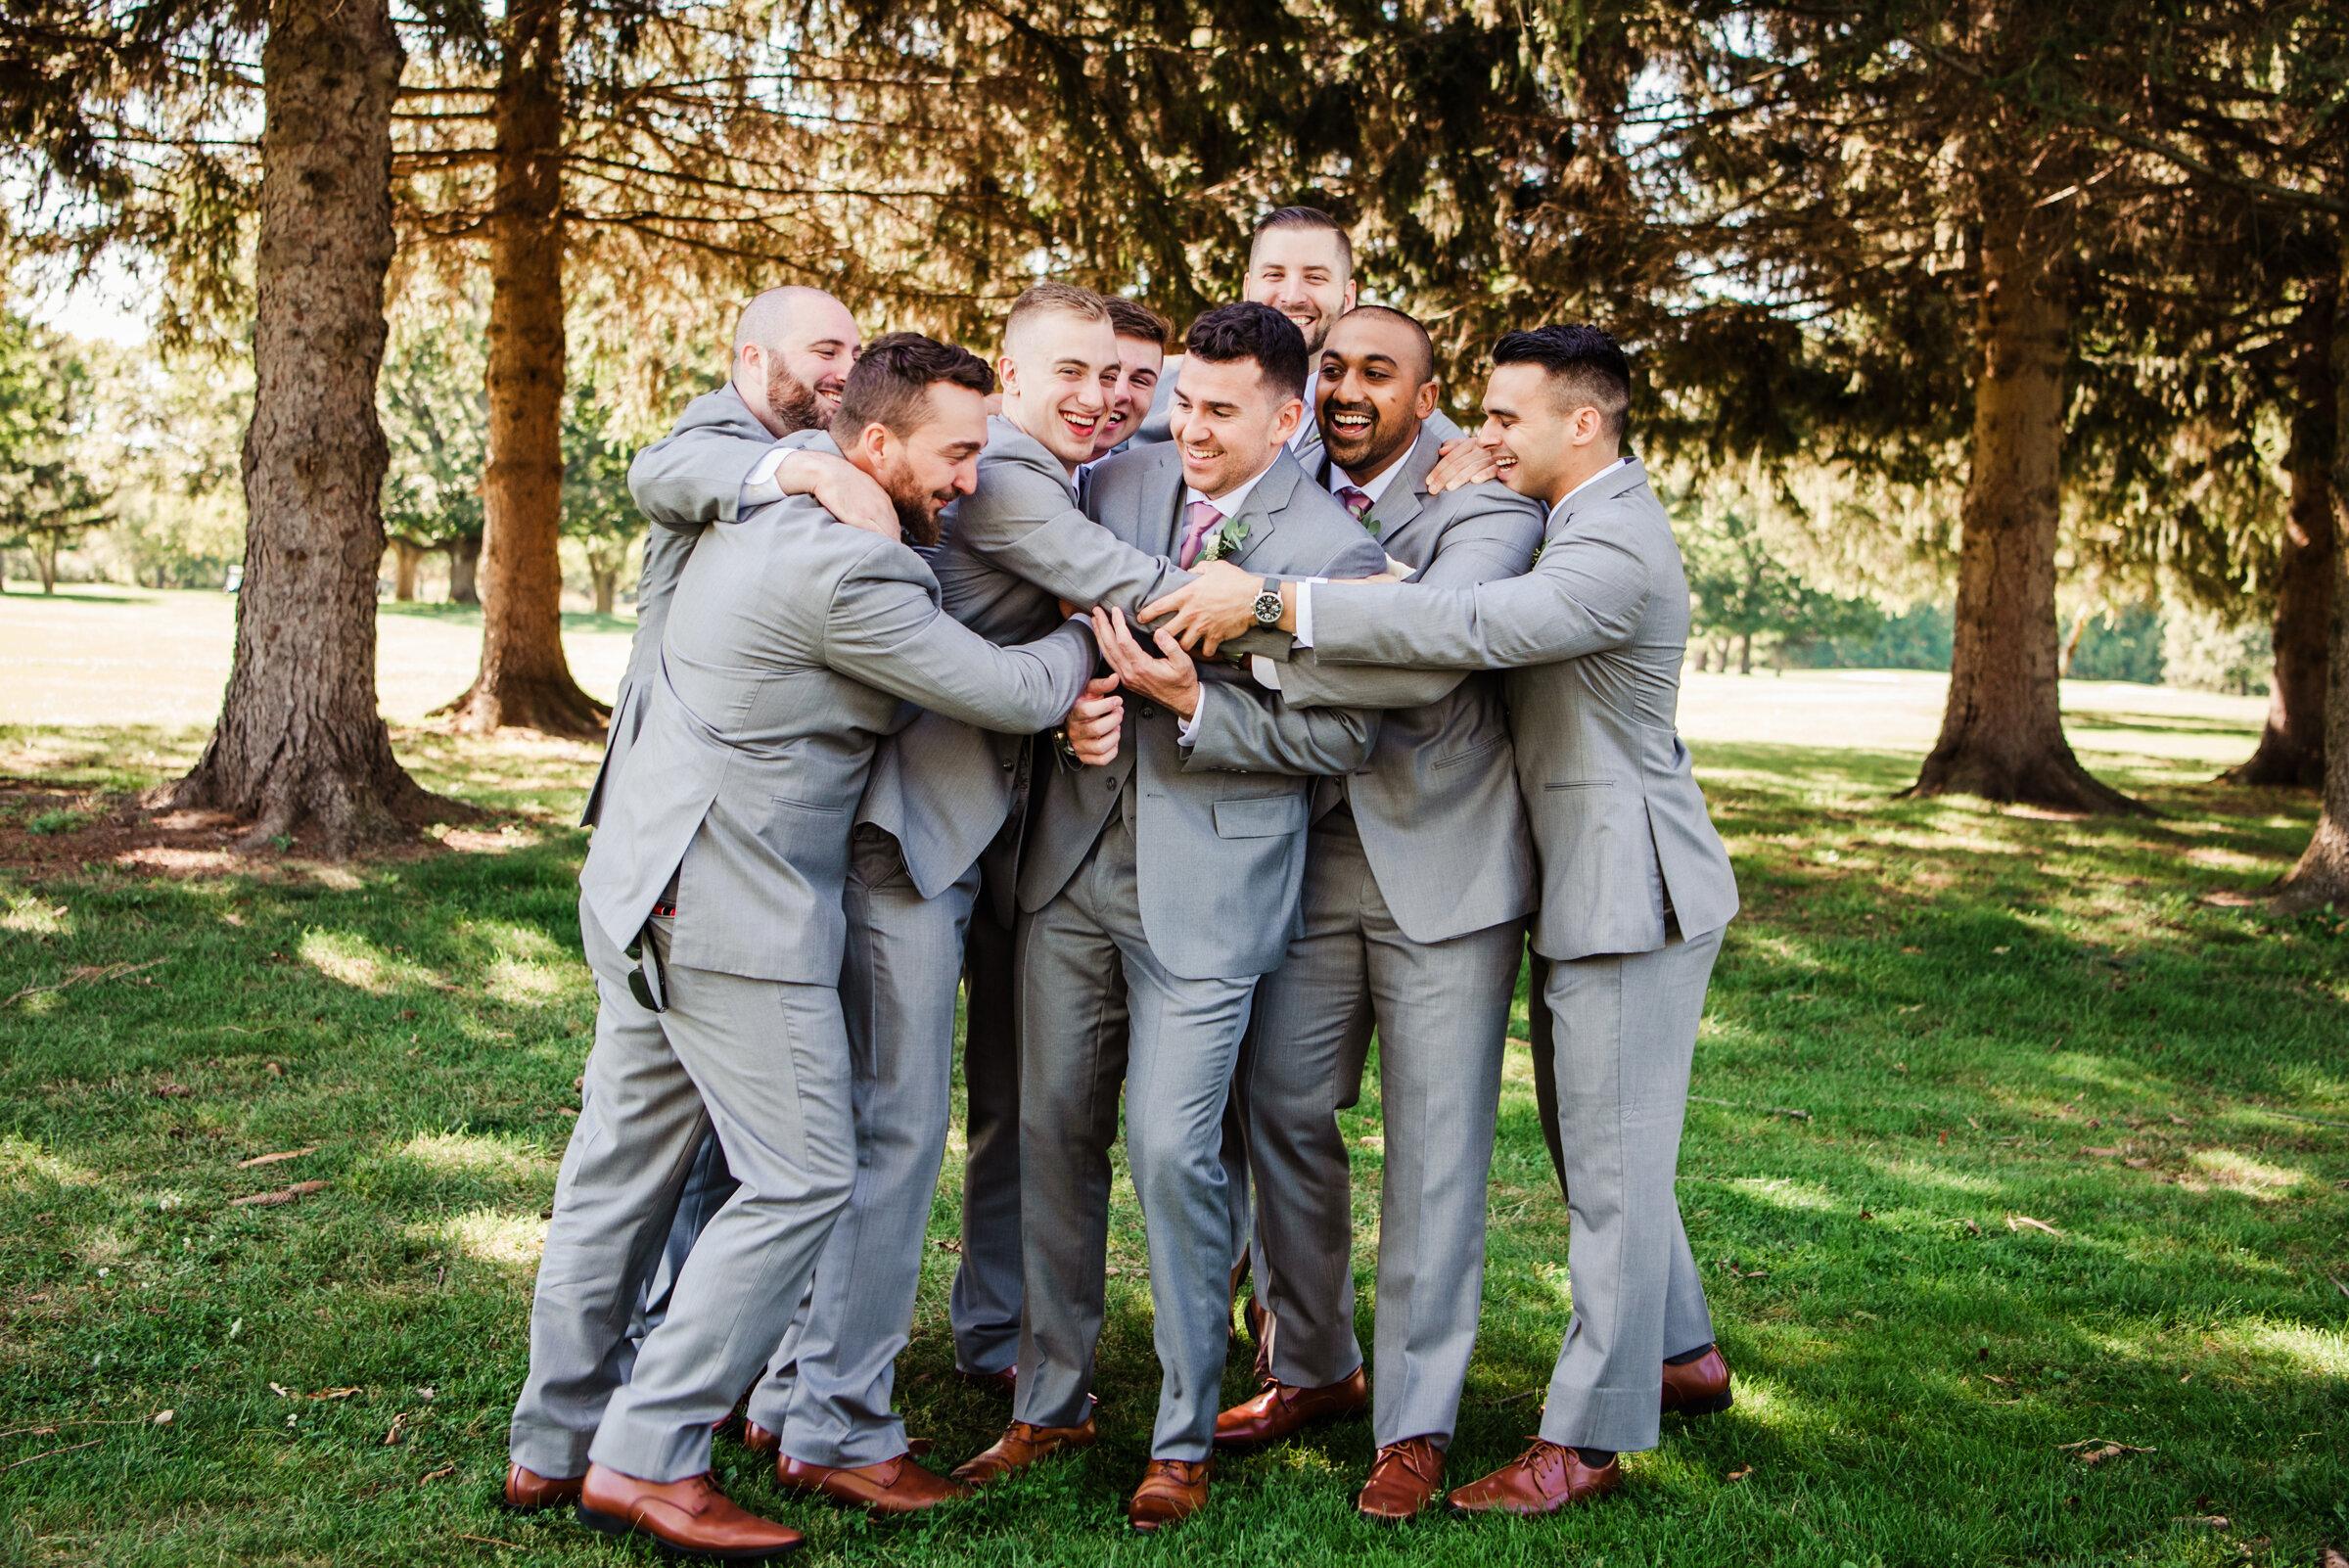 Deerfield_Country_Club_Rochester_Wedding_JILL_STUDIO_Rochester_NY_Photographer_DSC_6179.jpg